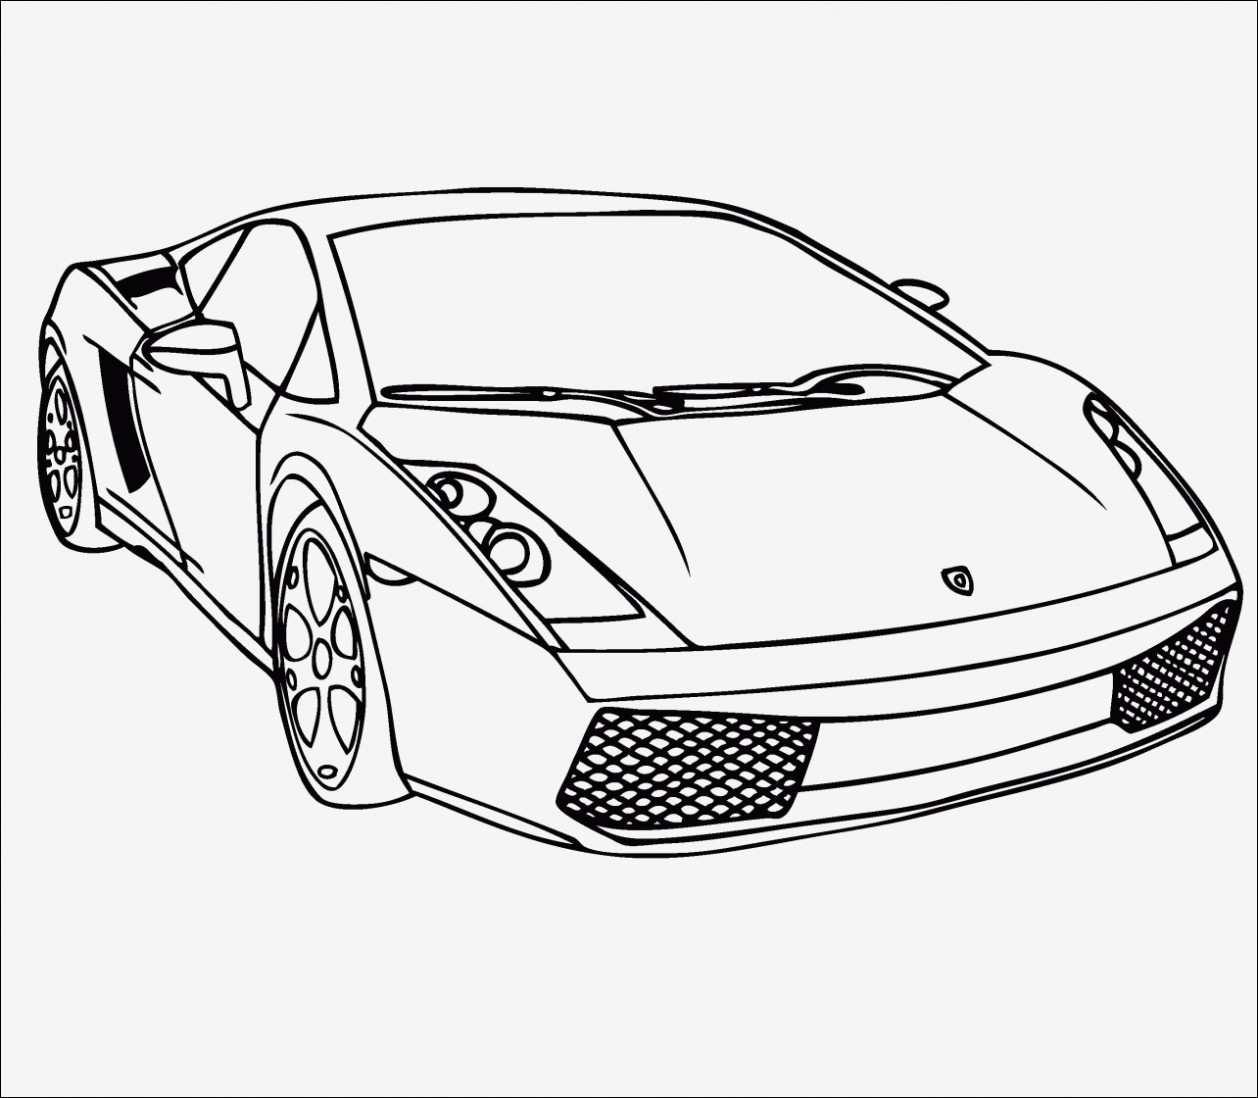 Beste 20 Bugatti Ausmalbilder - Beste Wohnkultur ...